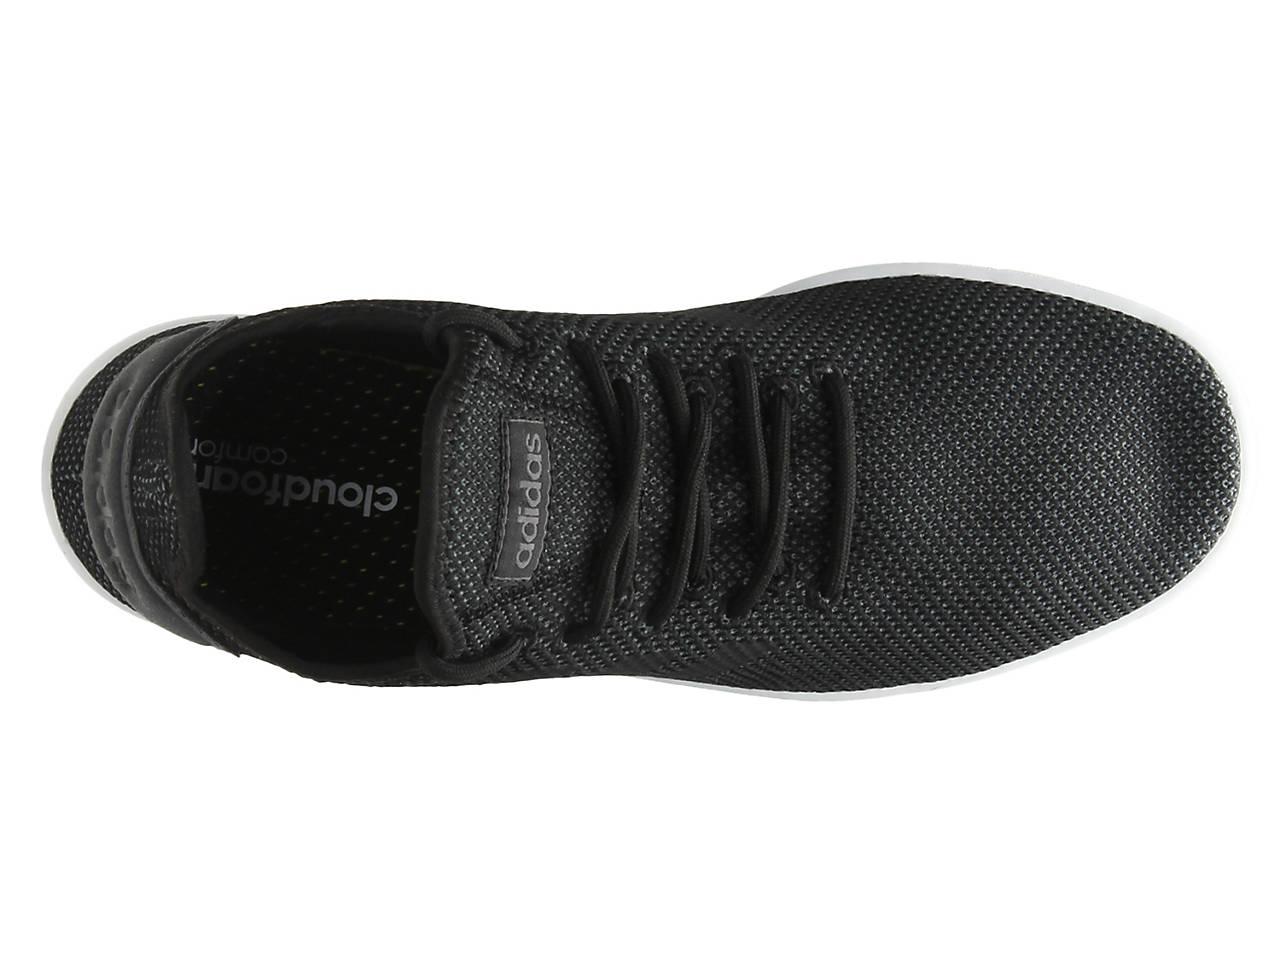 wholesale dealer 545e8 98b83 Court Adapt Sneaker - Men s. next